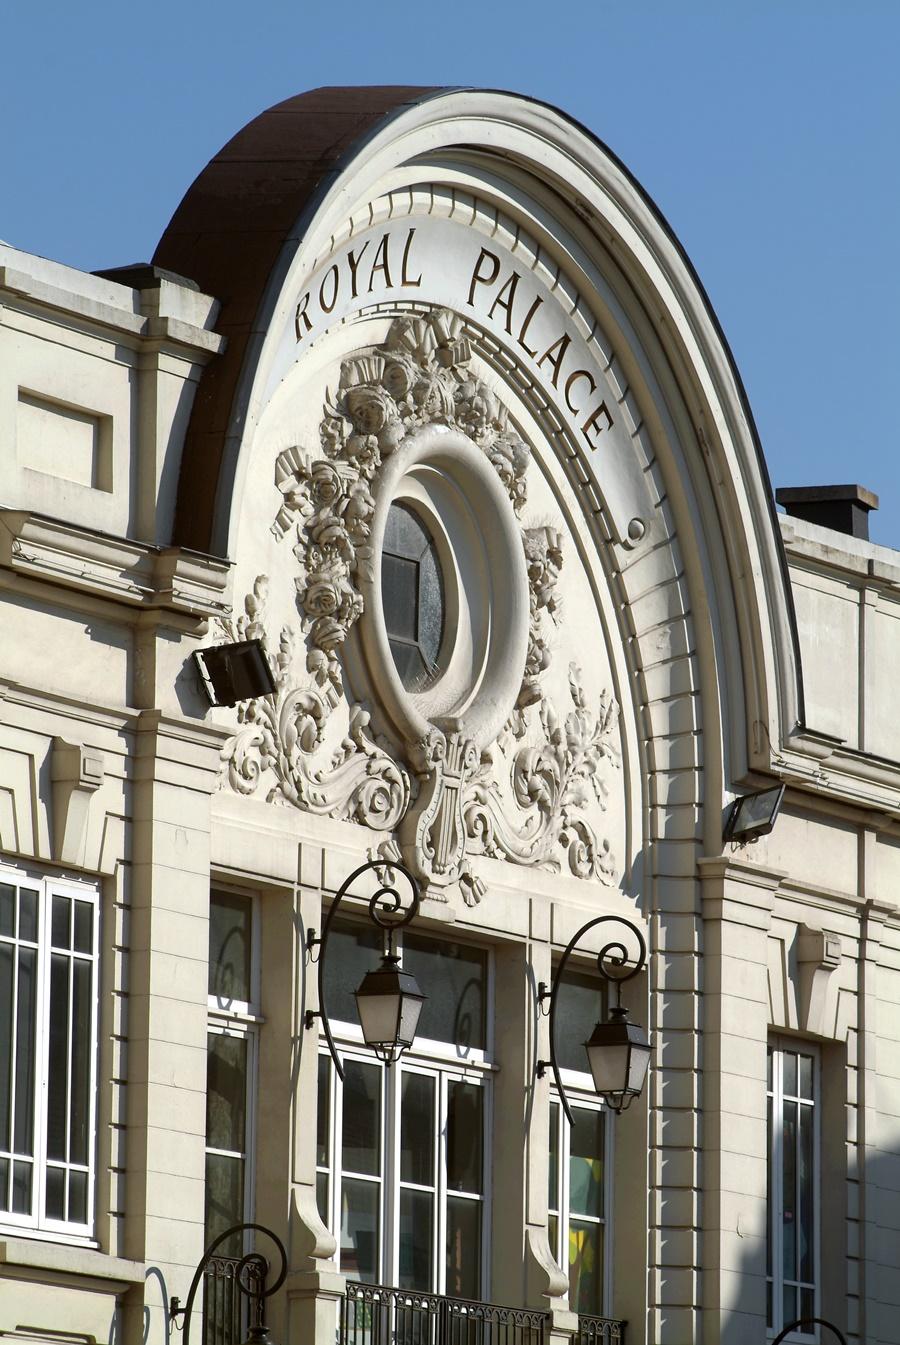 Cinema-royal-palace-1